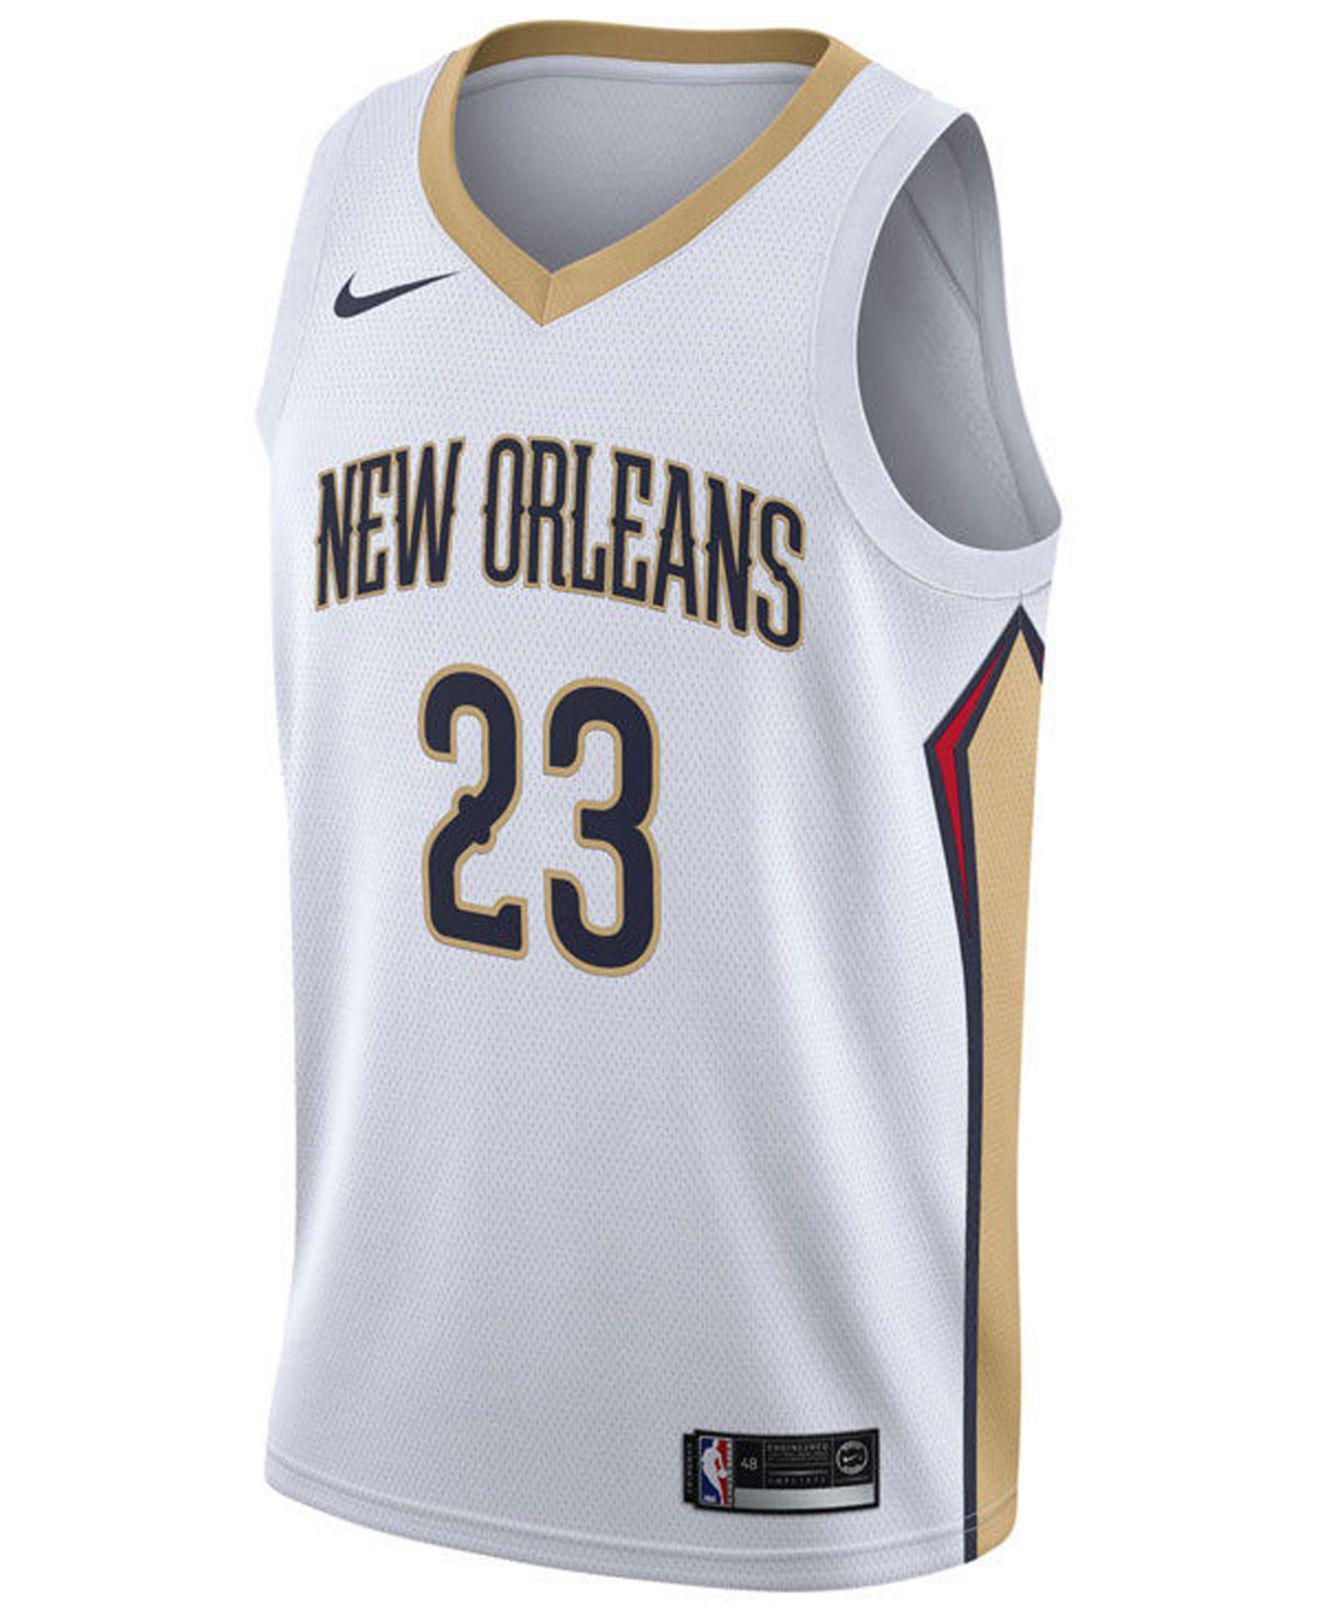 Lyst - Nike Anthony Davis New Orleans Pelicans Association Swingman Jersey  in White for Men c9a6f8ac8